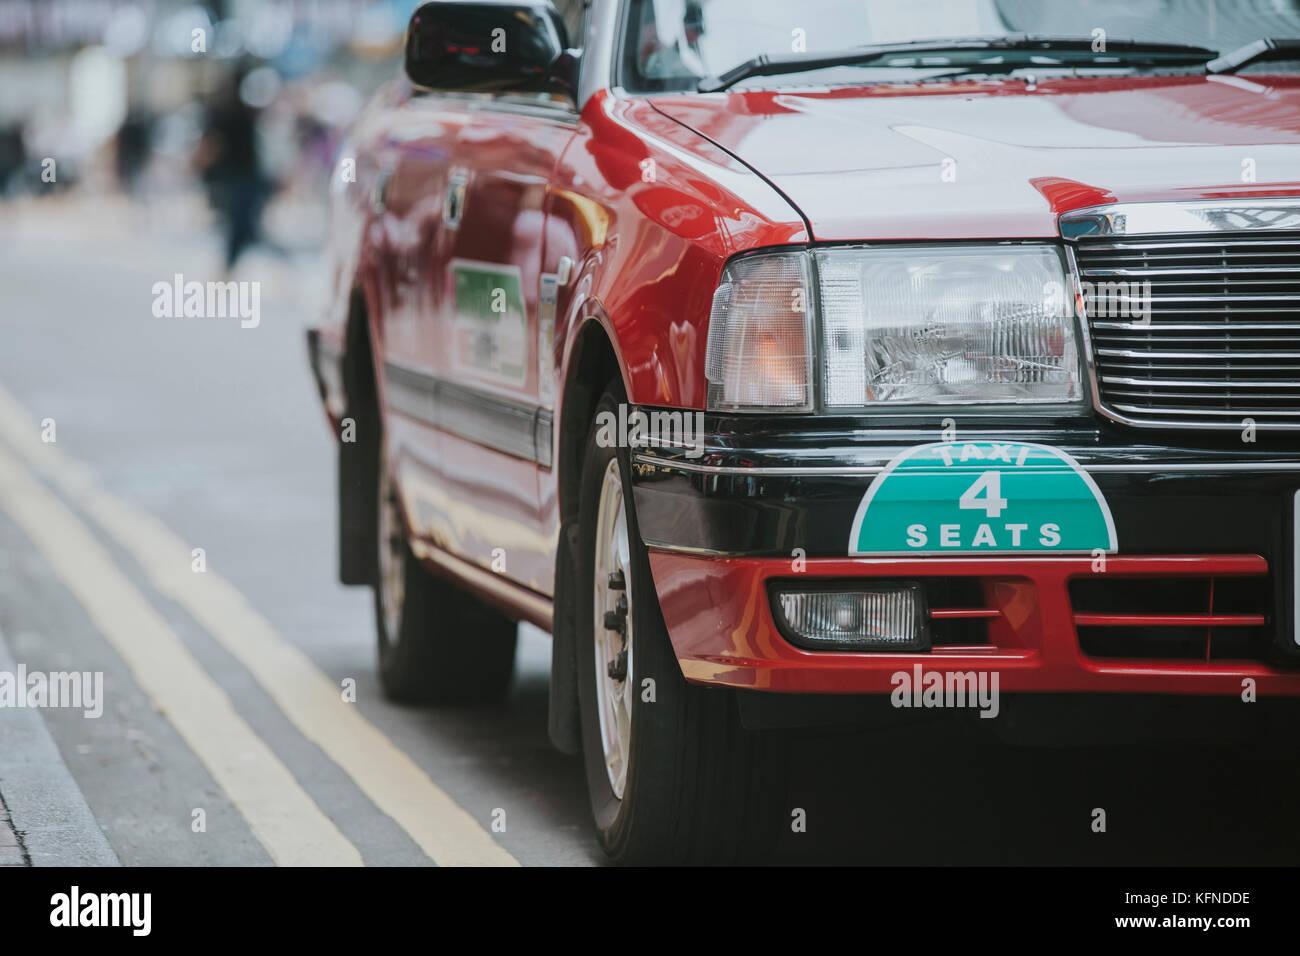 Hong Kong Taxi - Stock Image